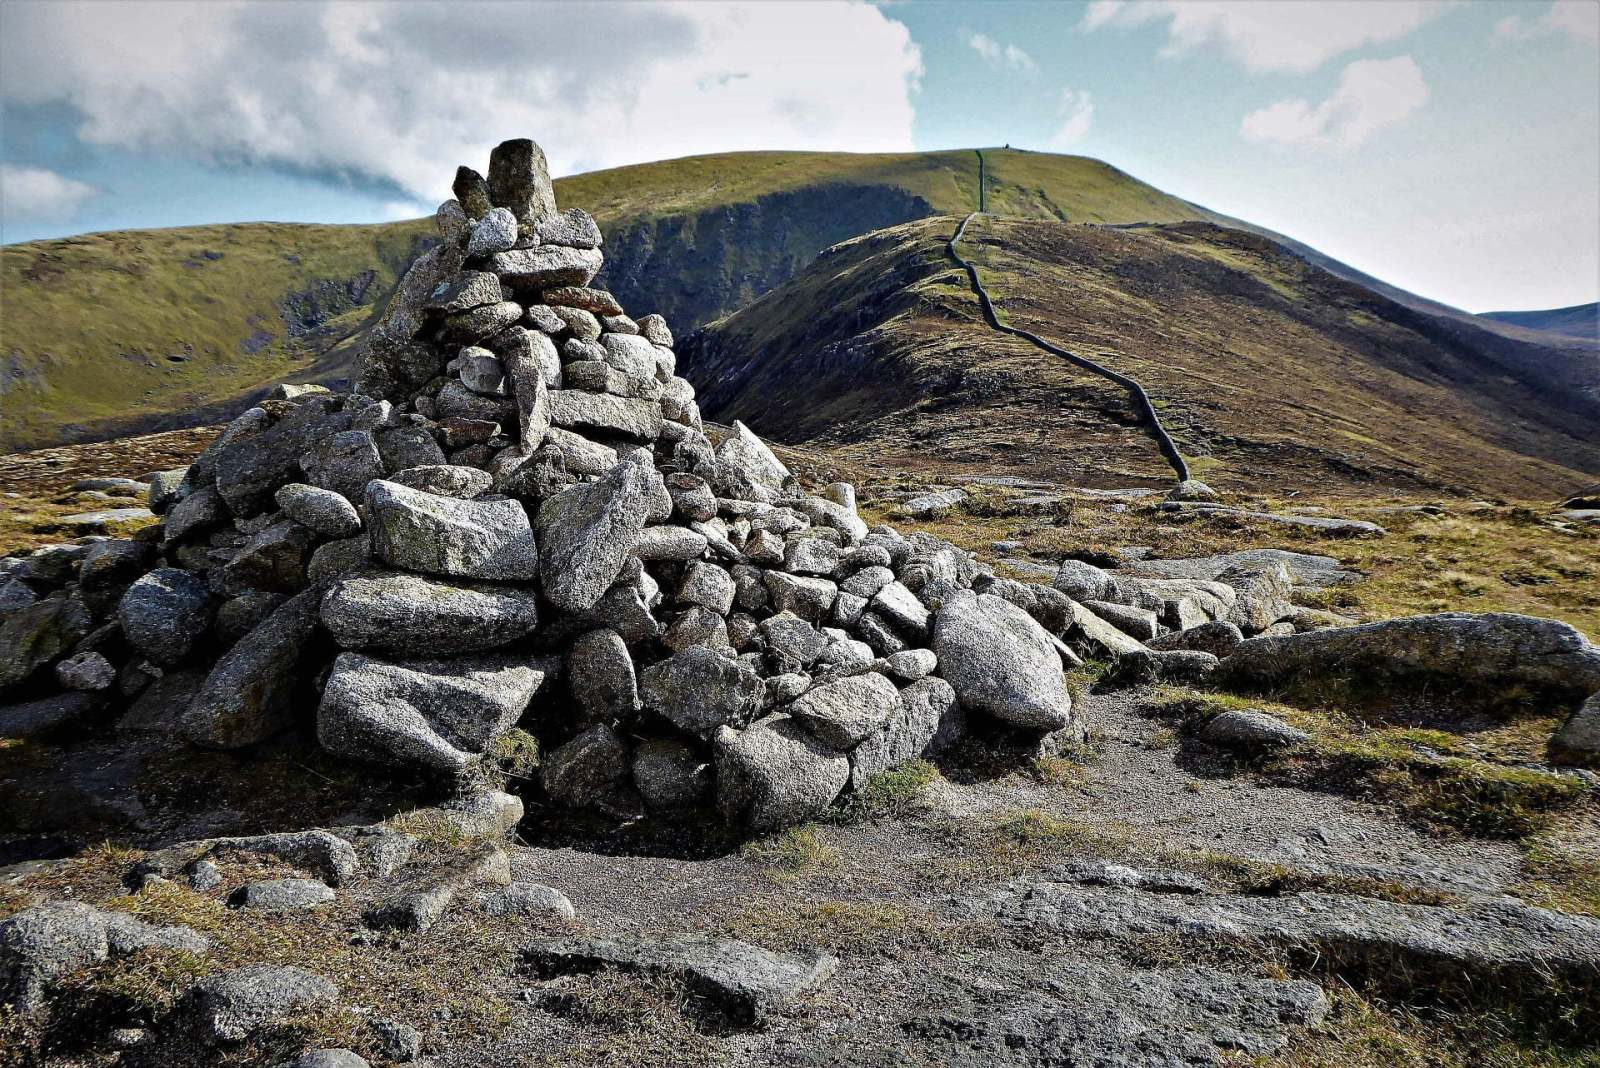 Walk up Slieve Commedagh via Hare's Gap